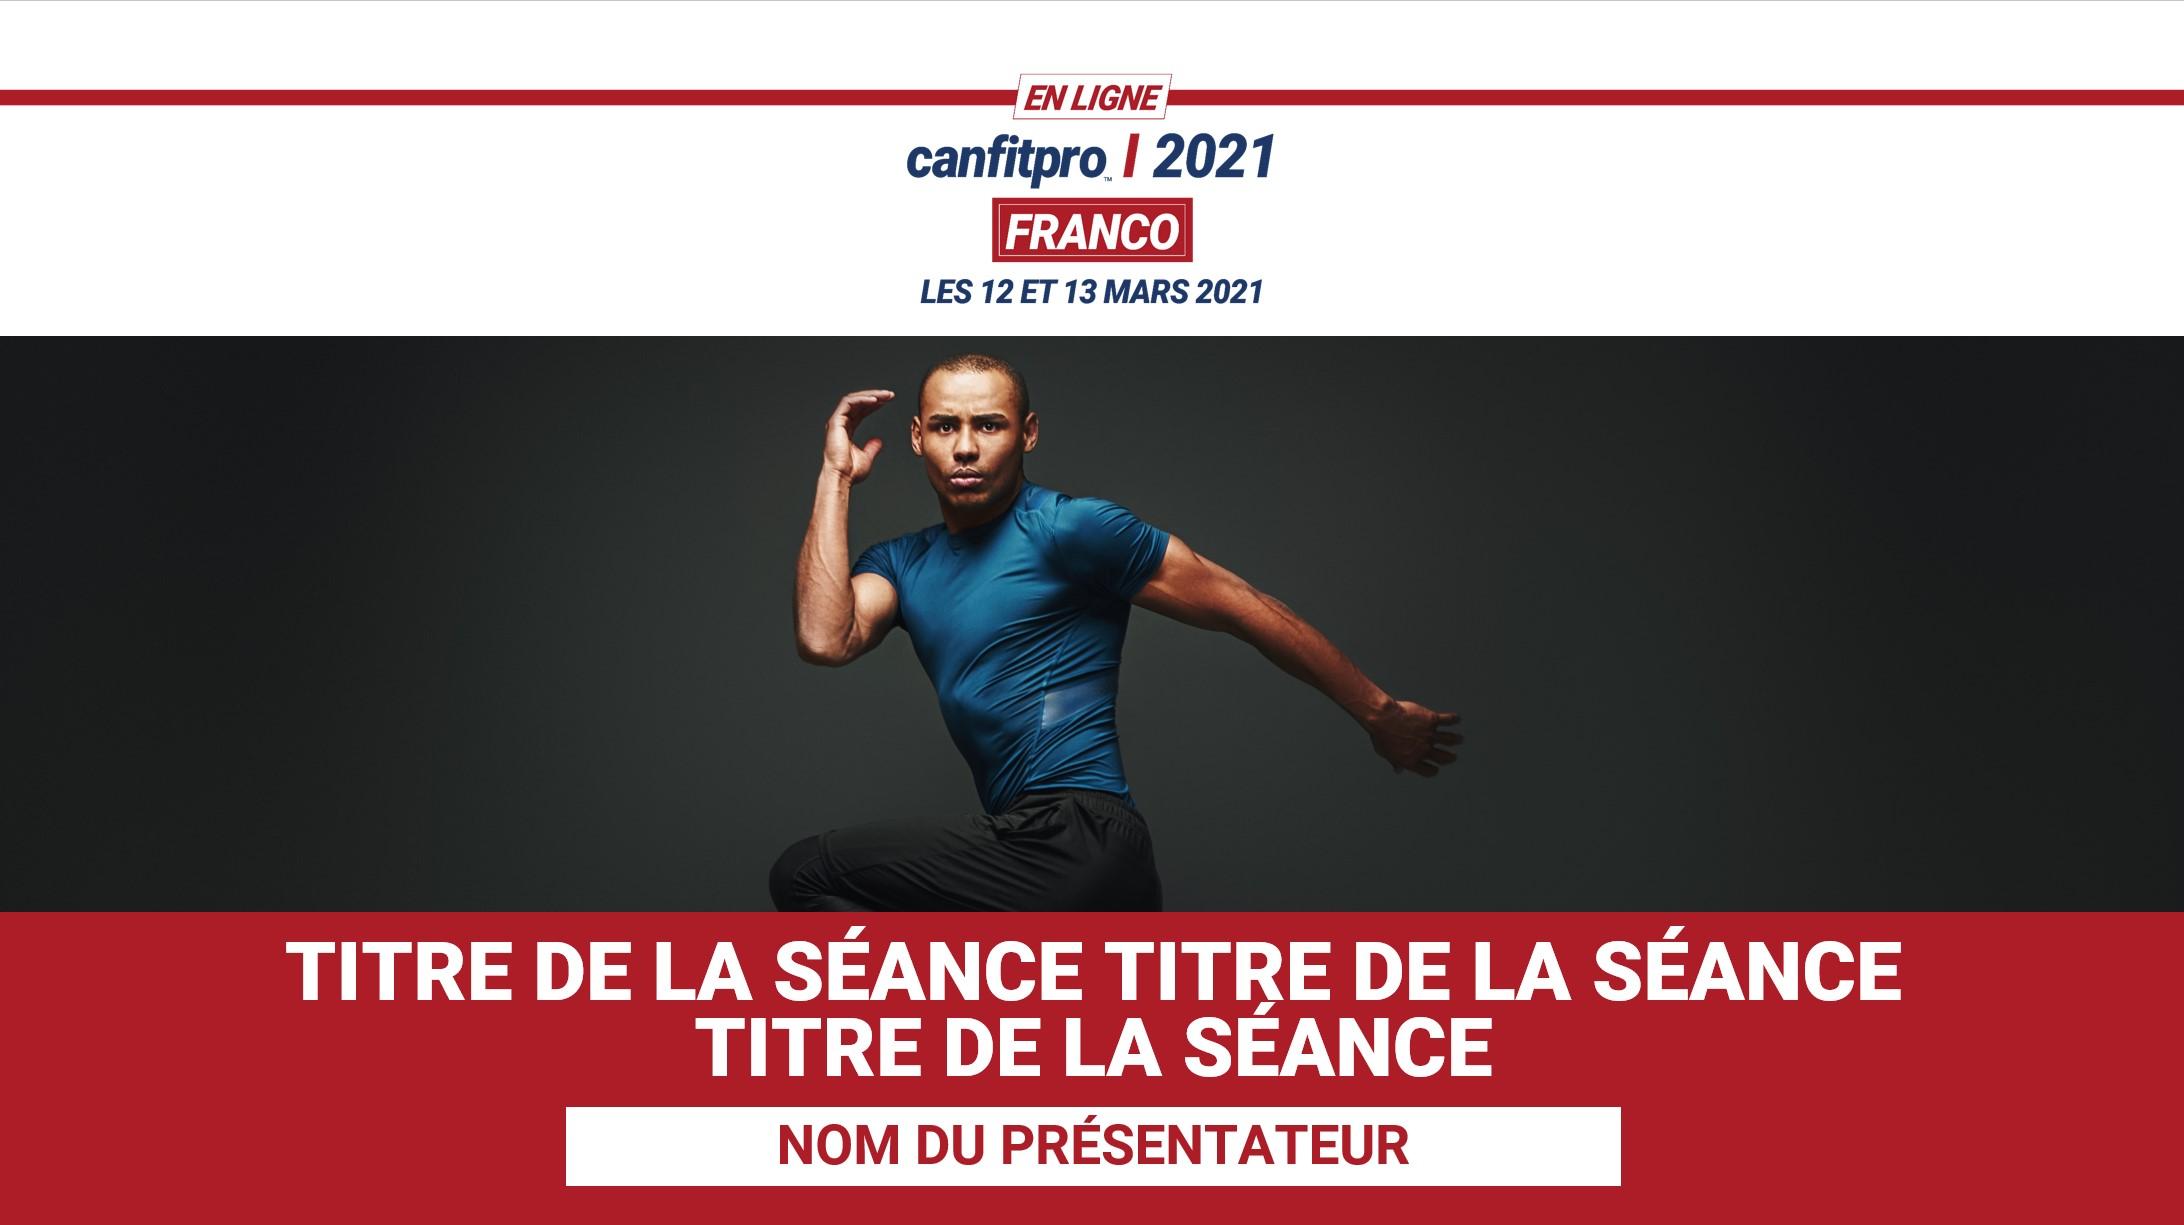 Franco presenter slides